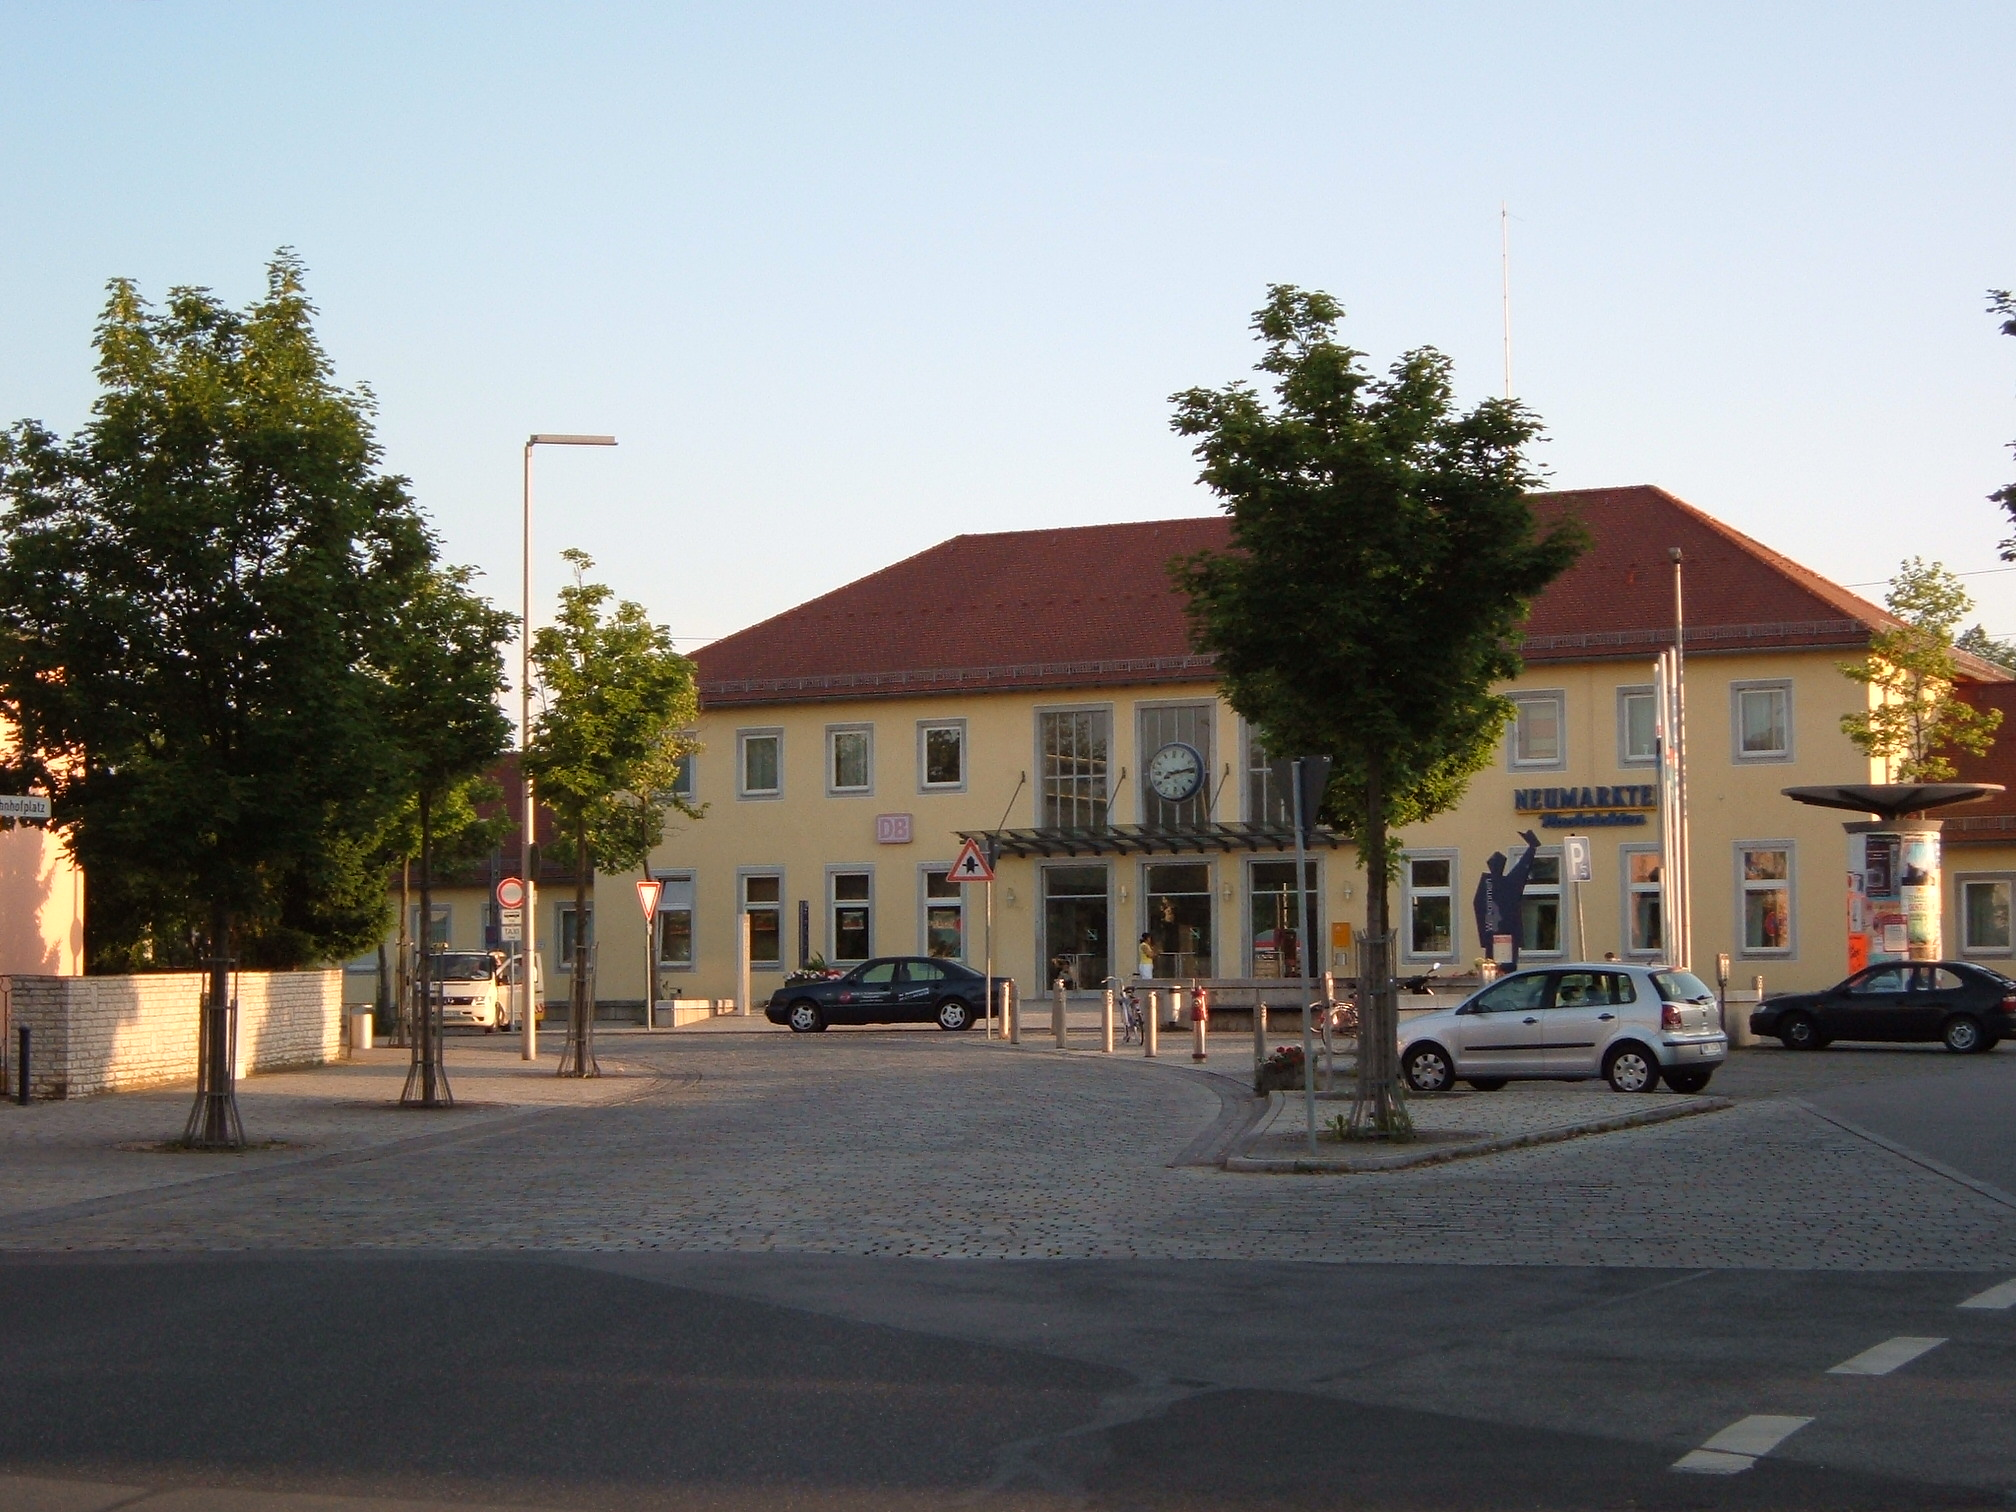 Neumarkt in der Oberpfalz Germany  city photos gallery : Bahnhof neumarkt Wikipedia, the free encyclopedia